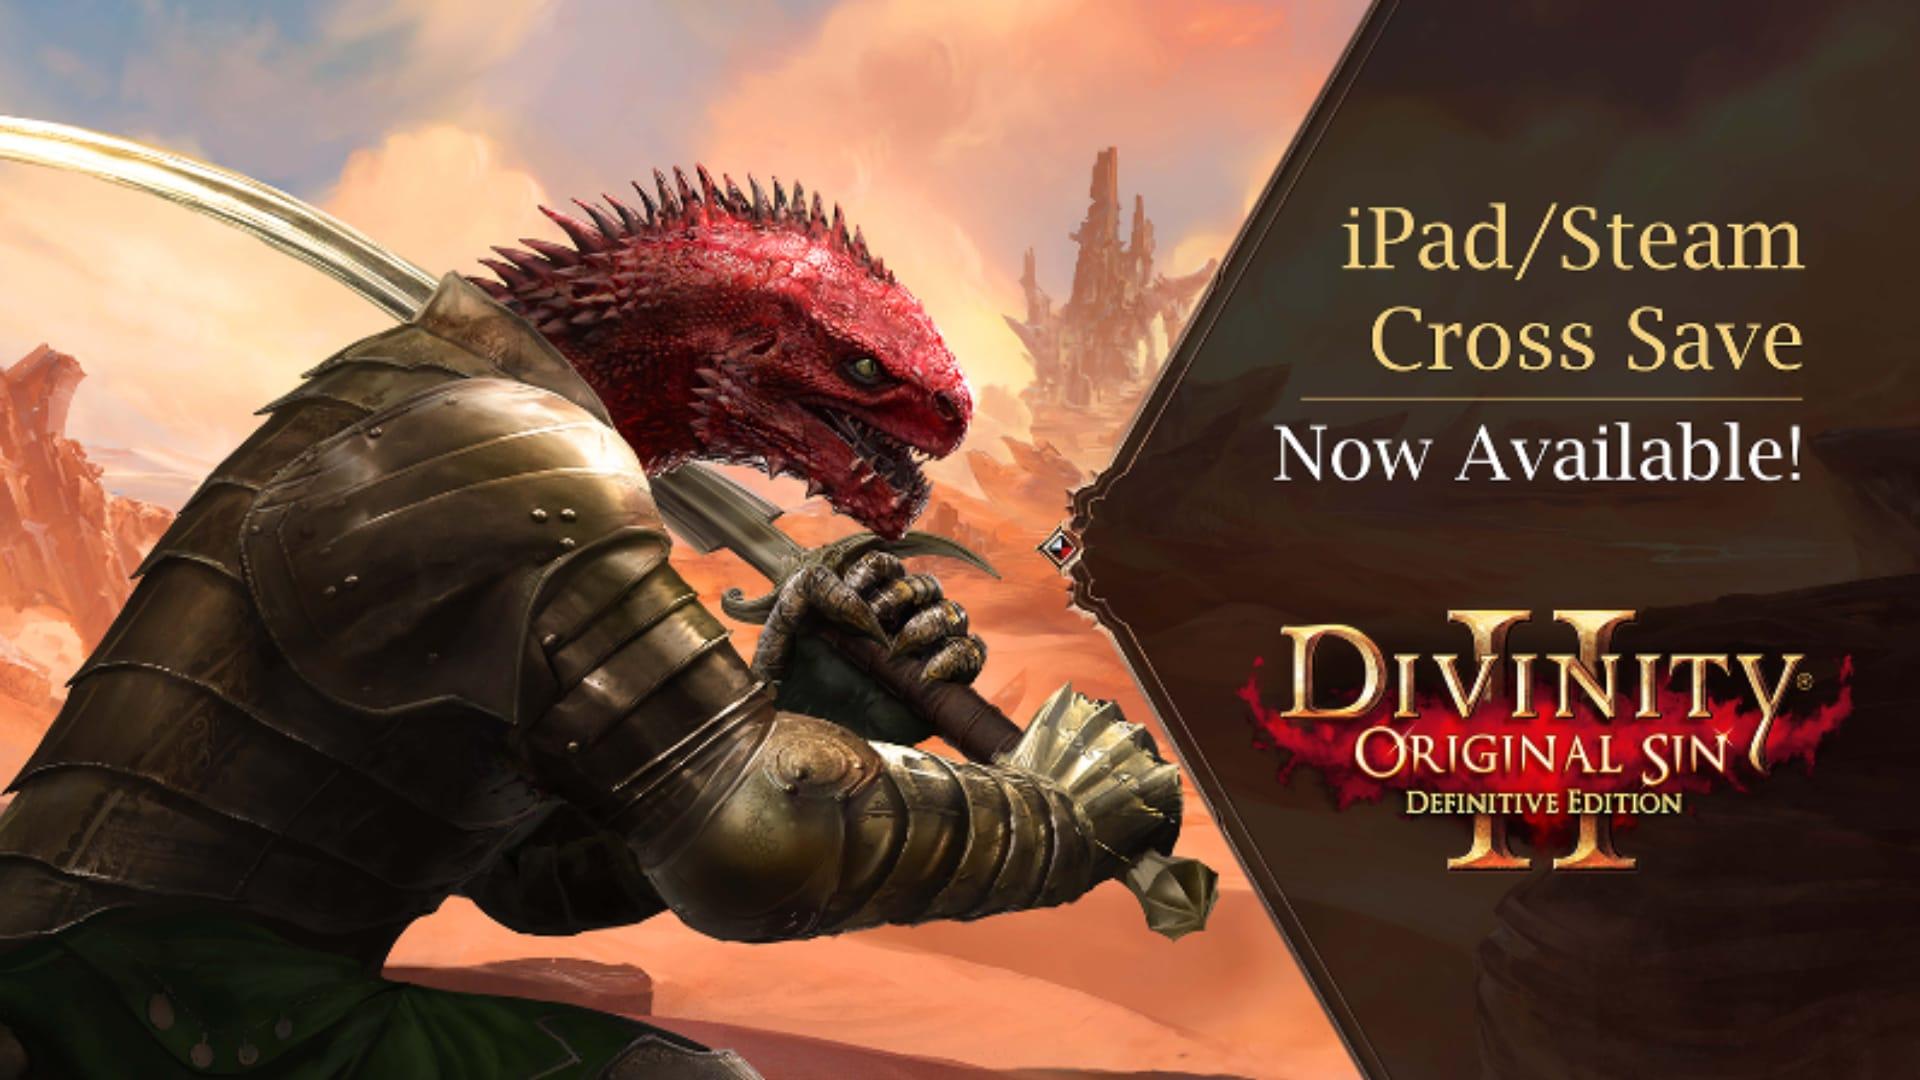 Divinity Original Sin 2 Update 1.15